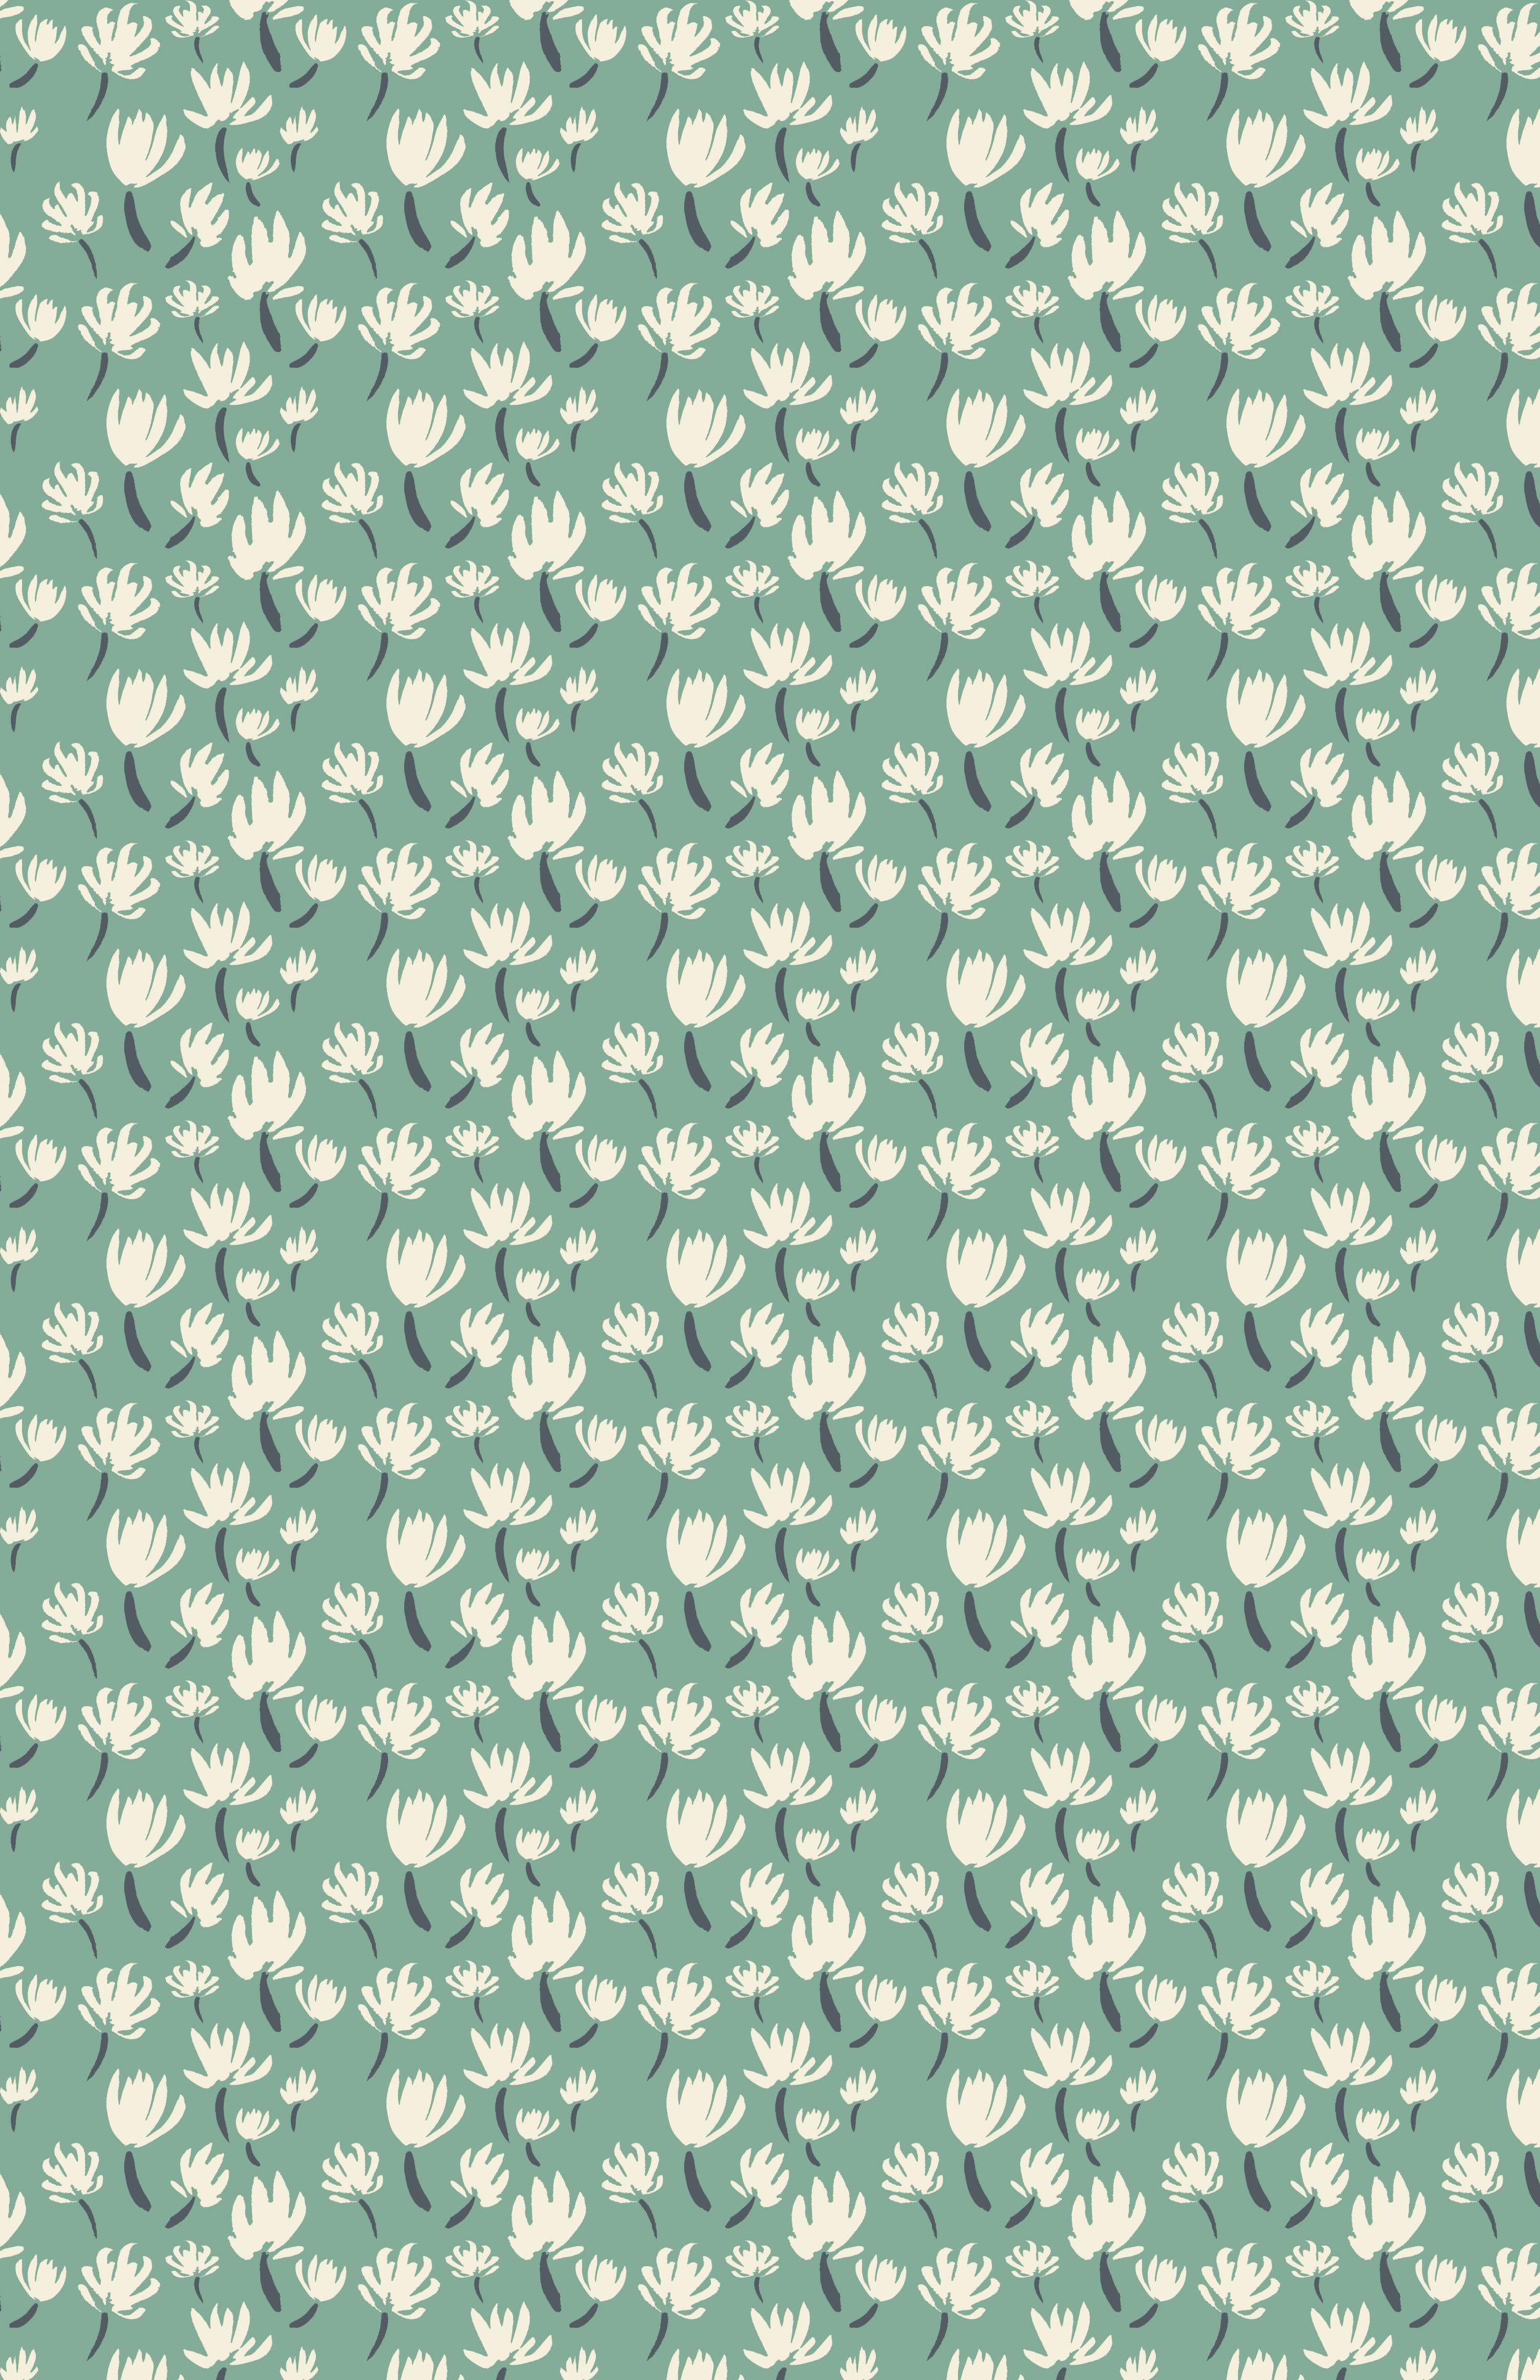 Dandelions. ink and digital repeating pattern.